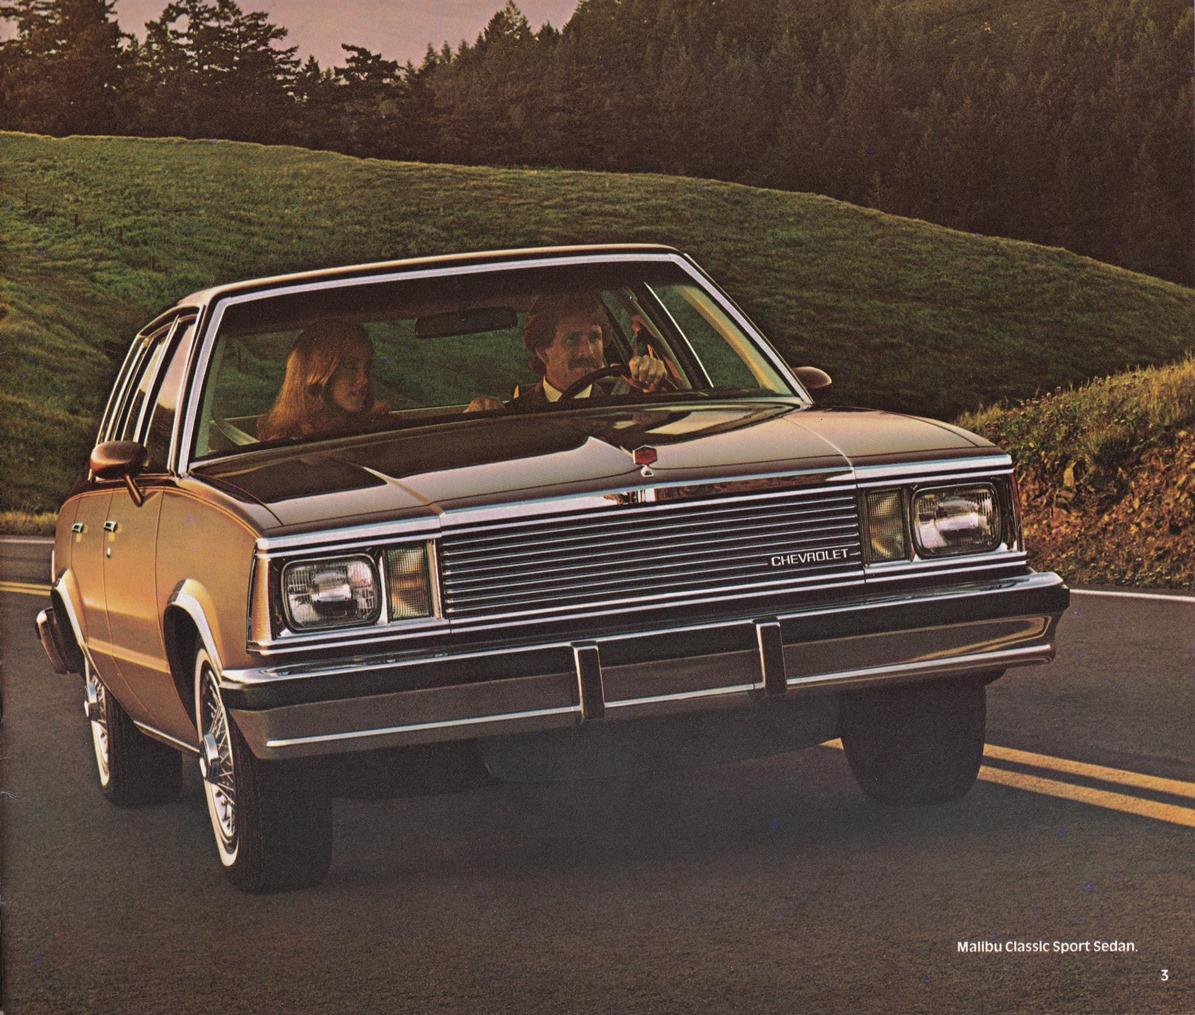 Curbside Classic: 1981 Chevrolet Malibu Classic